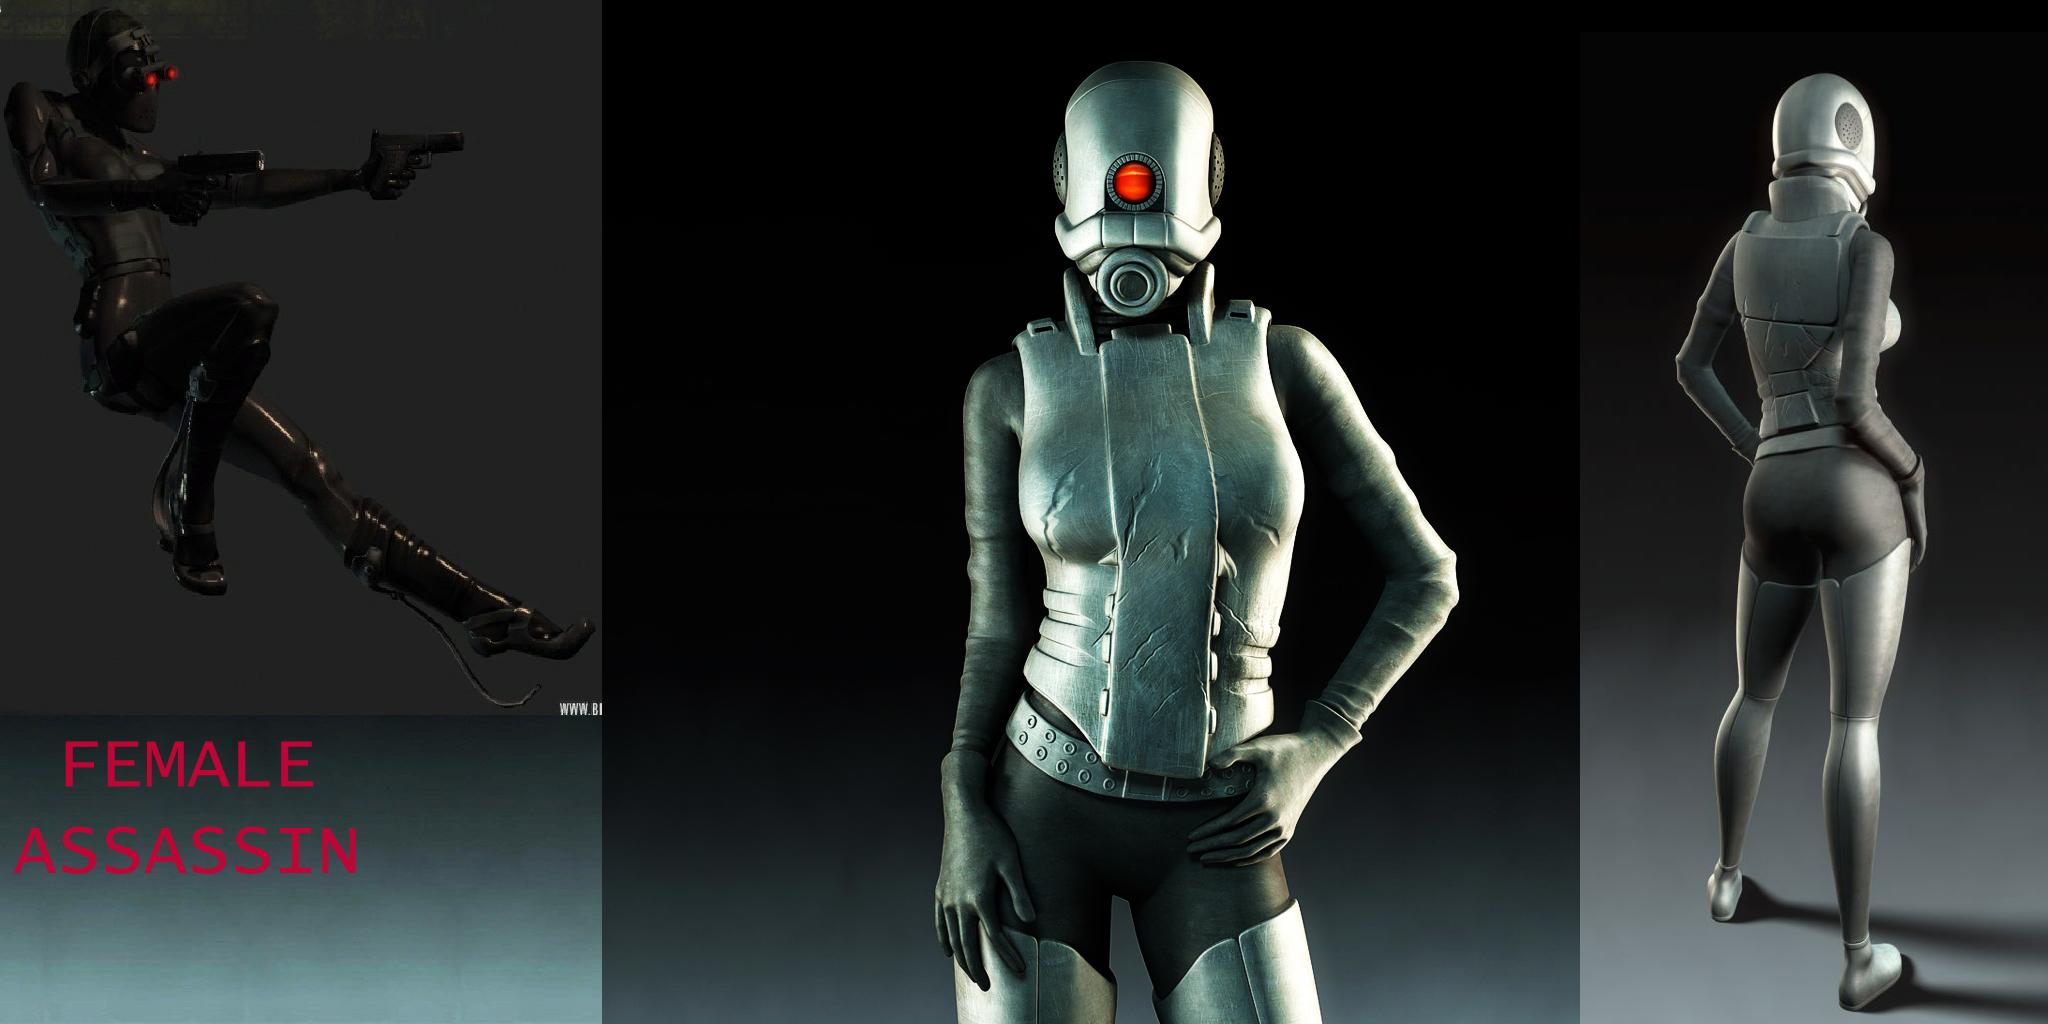 Female Assassin Background addon   Garrys Mod for Half Life 2   Mod DB 2048x1024